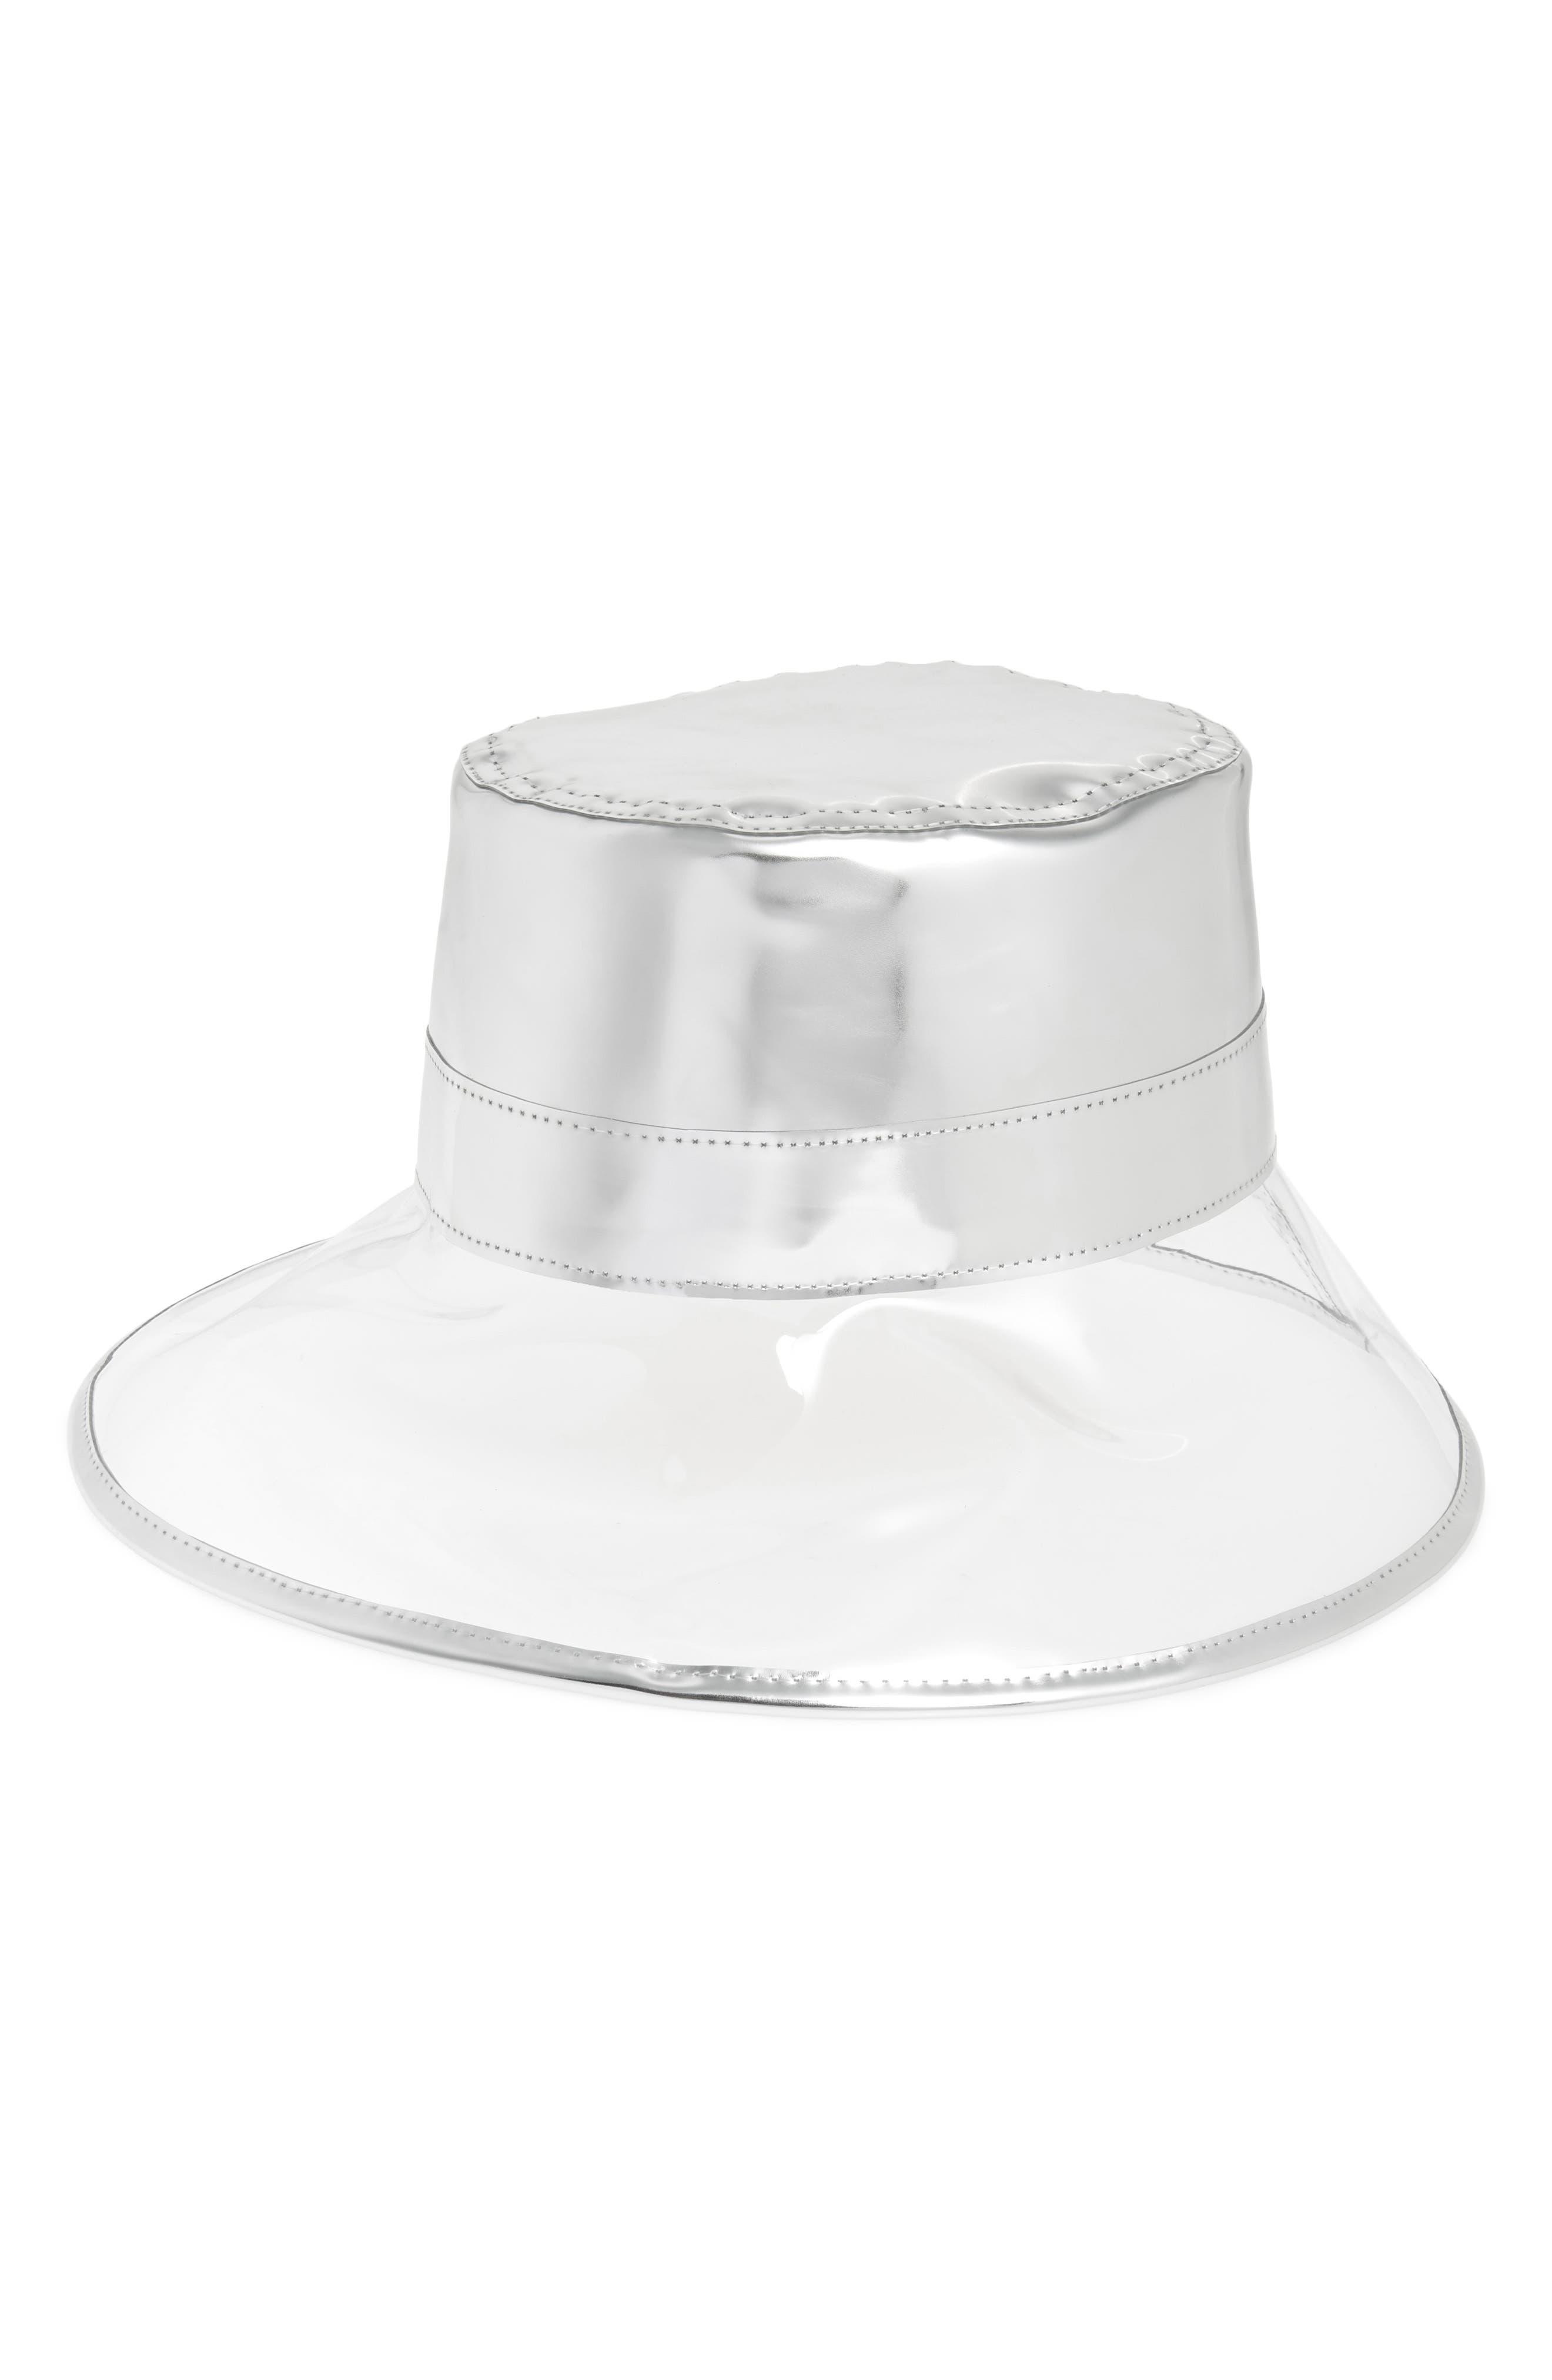 Go Go Rain Bucket Hat - Metallic in Crystal/ Silver